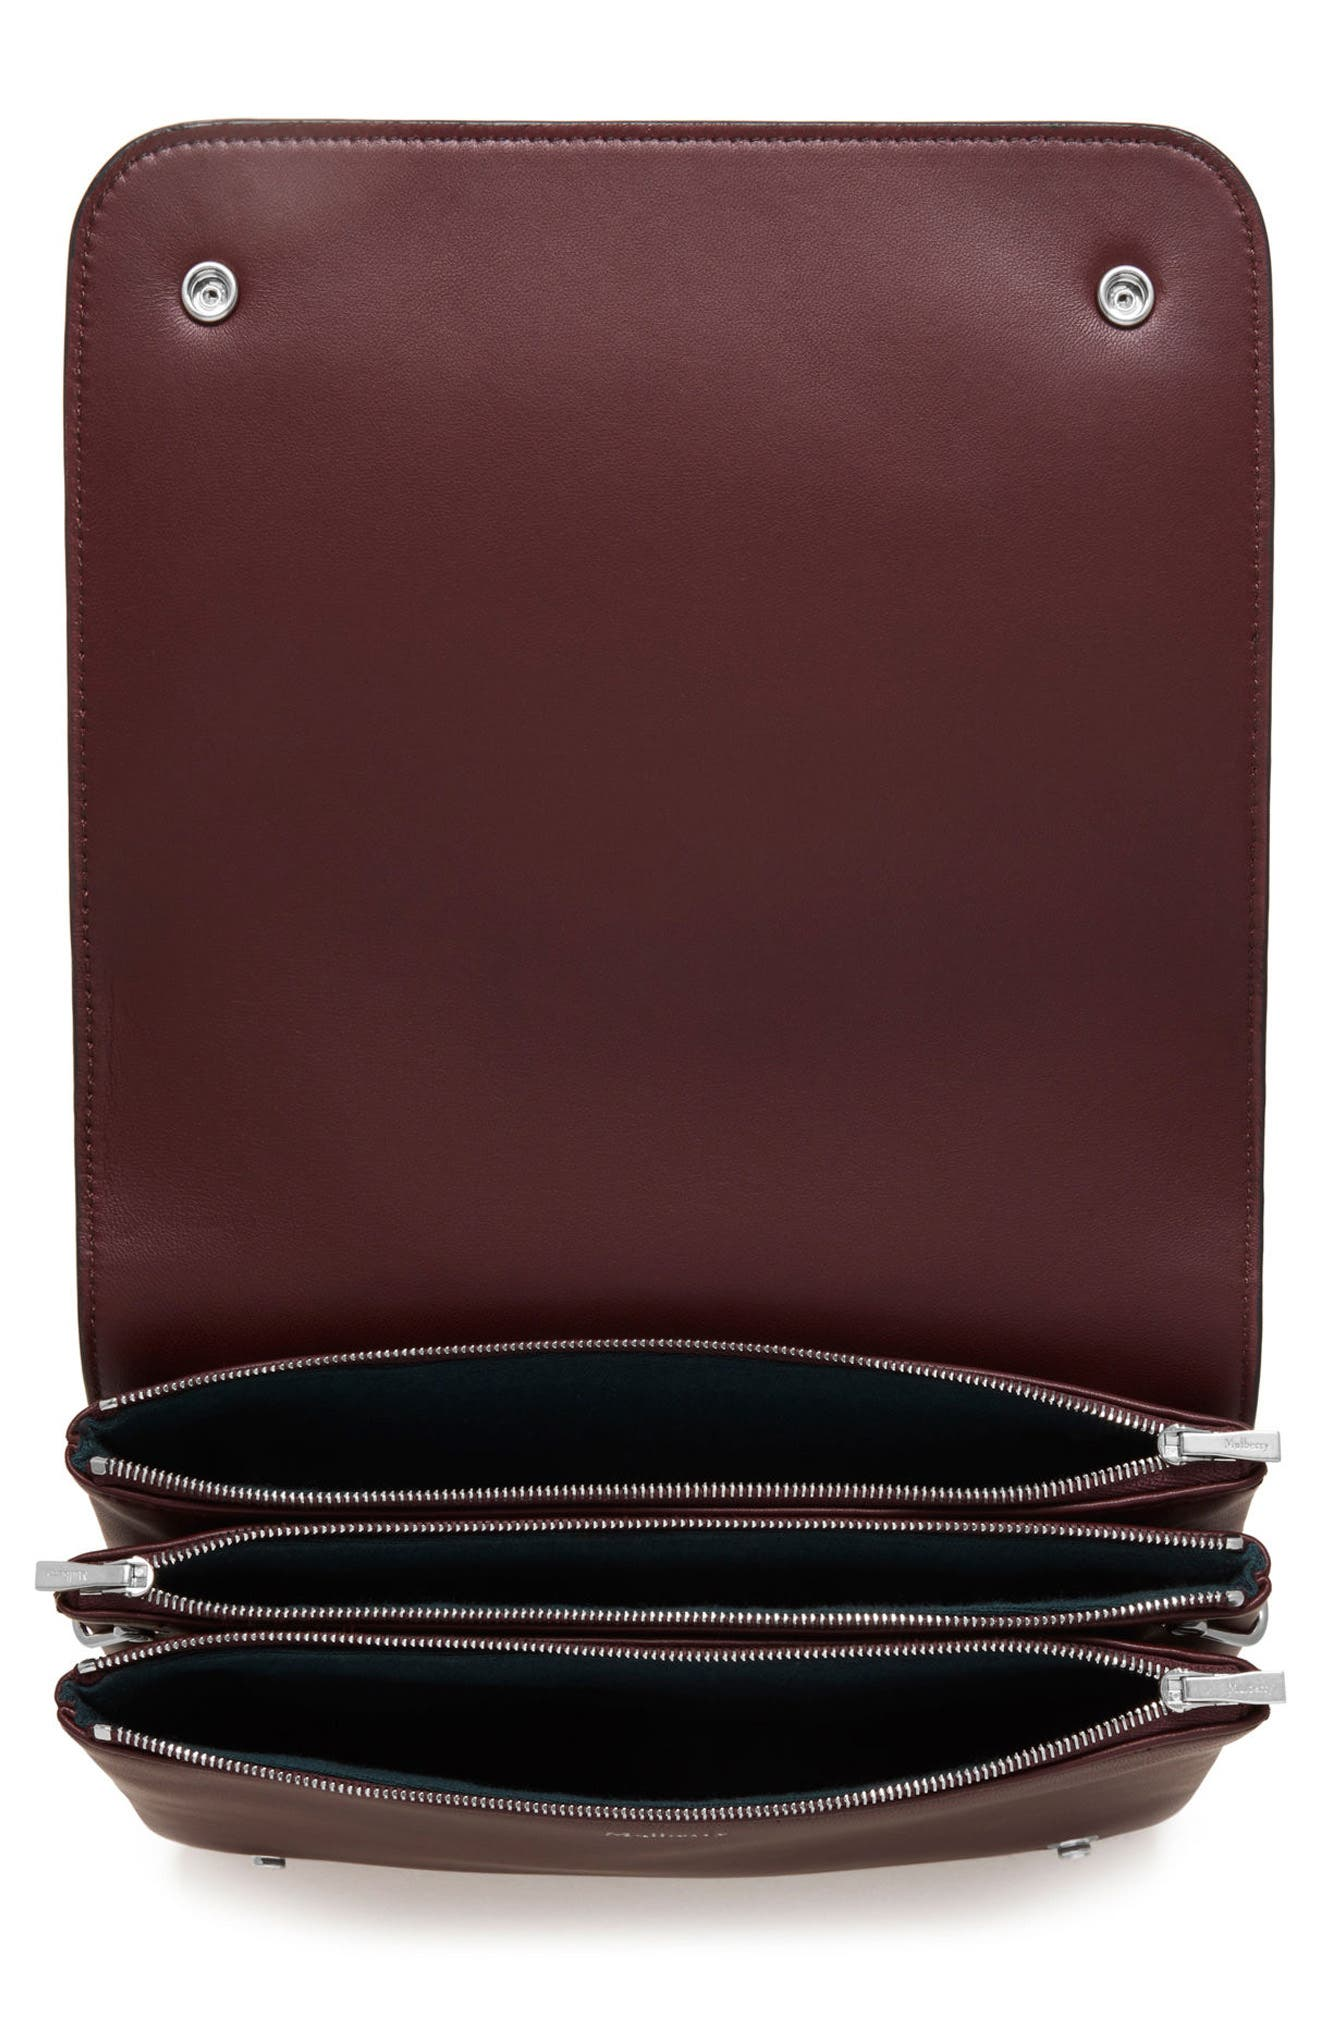 Clifton Leather Bag,                             Alternate thumbnail 3, color,                             930